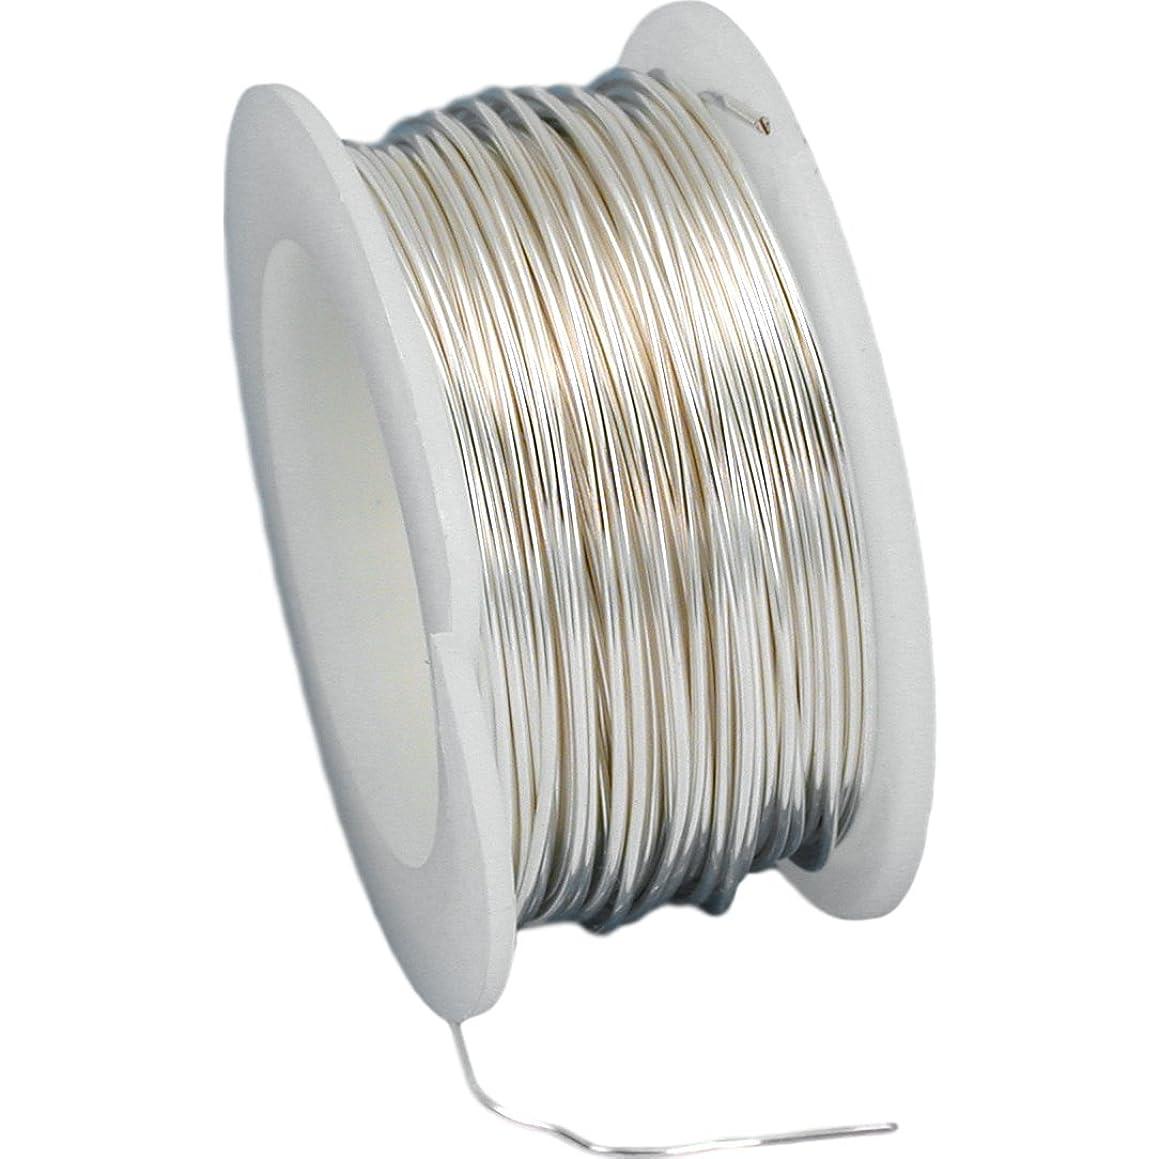 22 Gauge Copper Wire - 8yd/Natural Silver